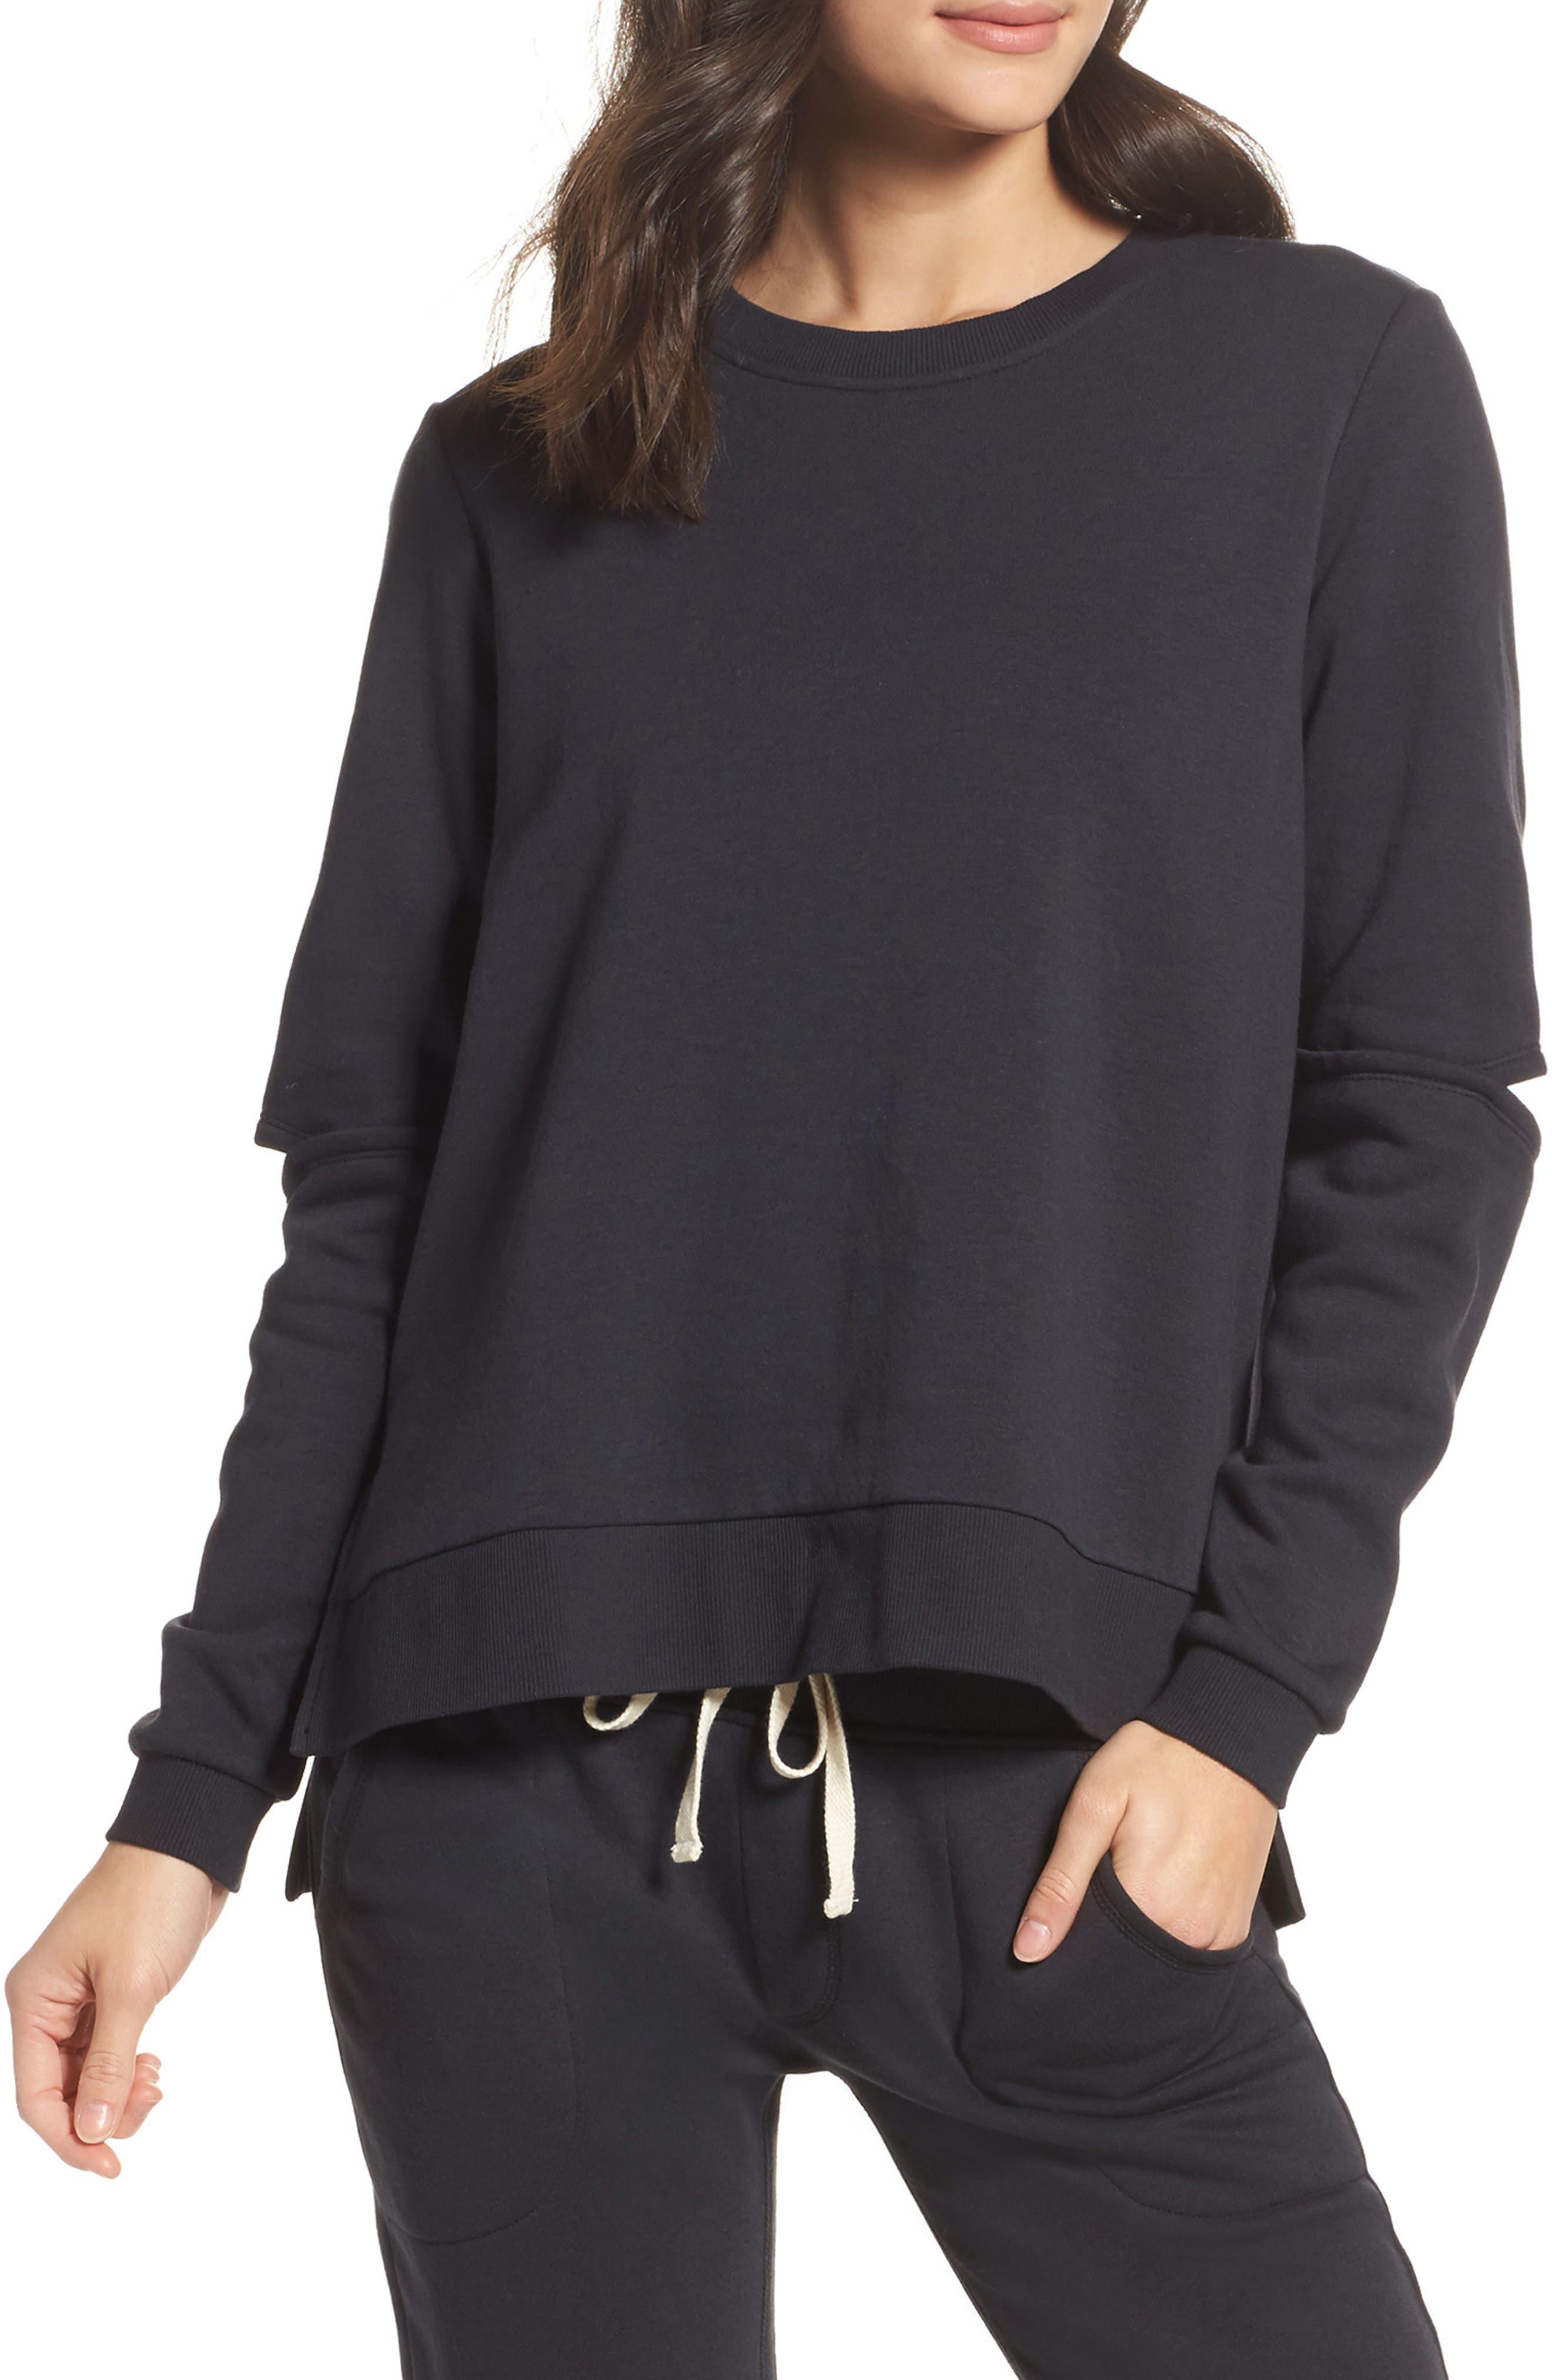 Alternate Image 1 Selected - Alternative Cutout Sweatshirt